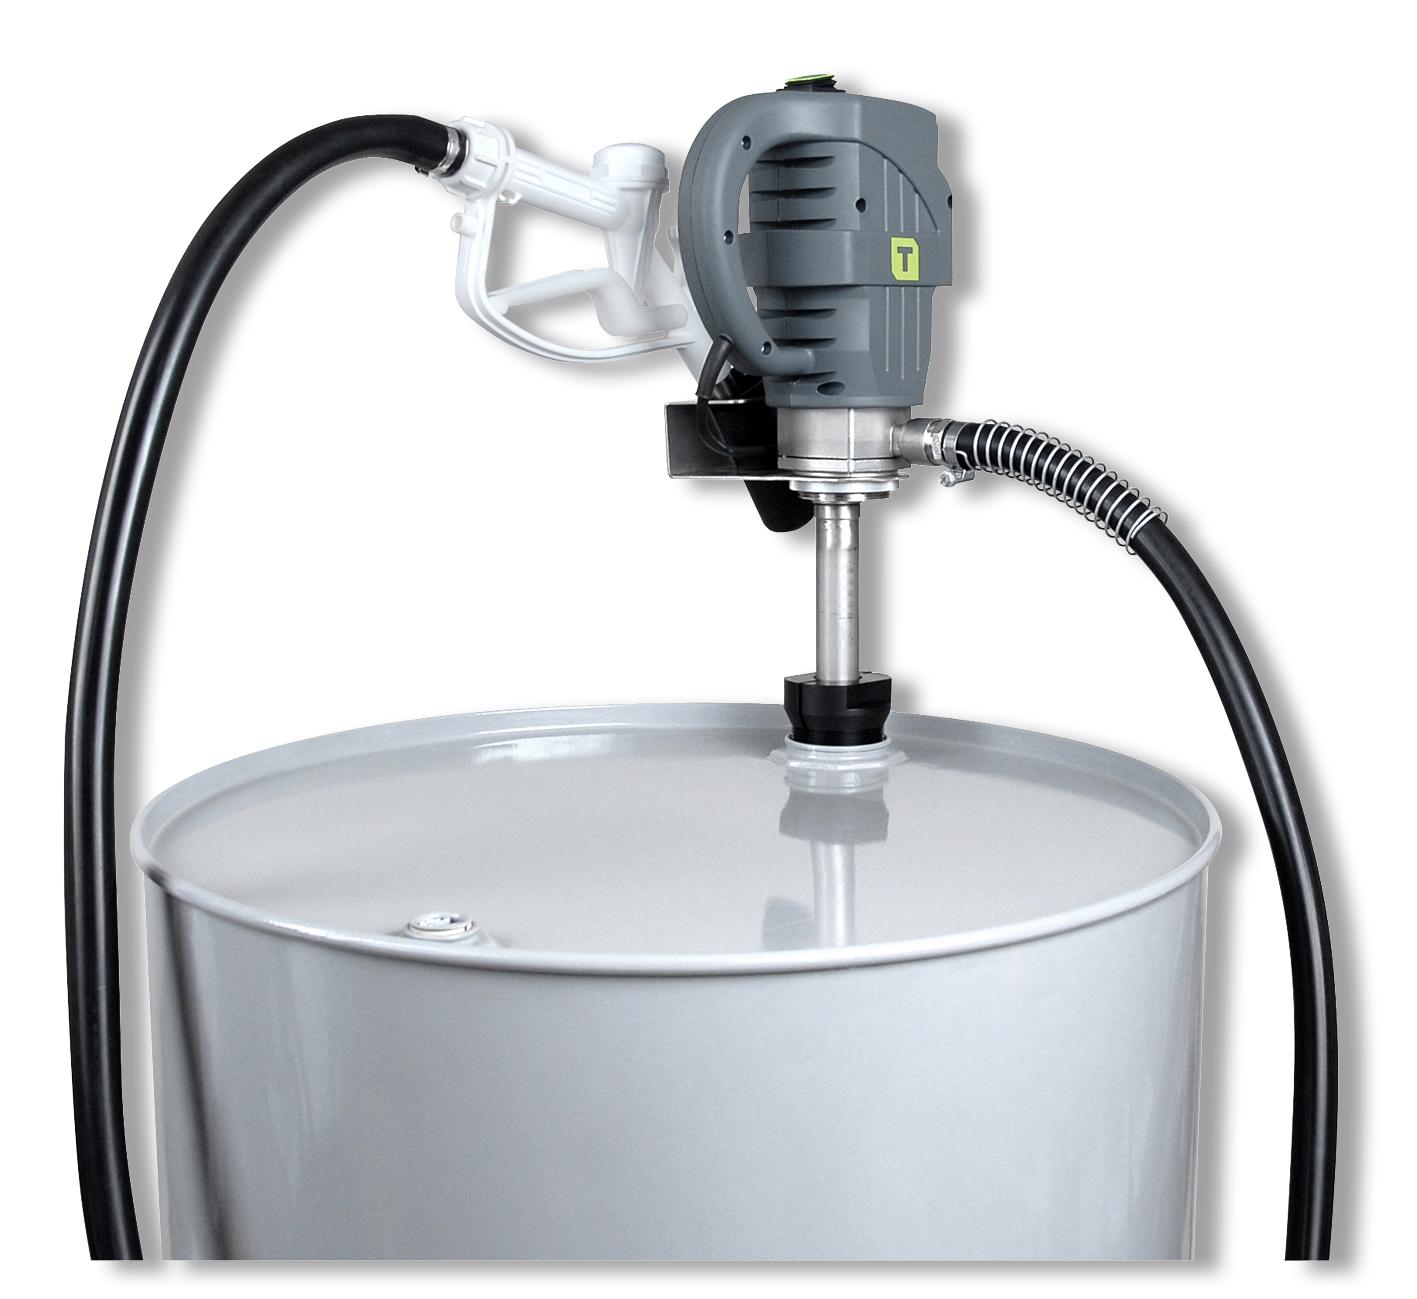 Pompe adblue pour fut hornet w 85 h inox light